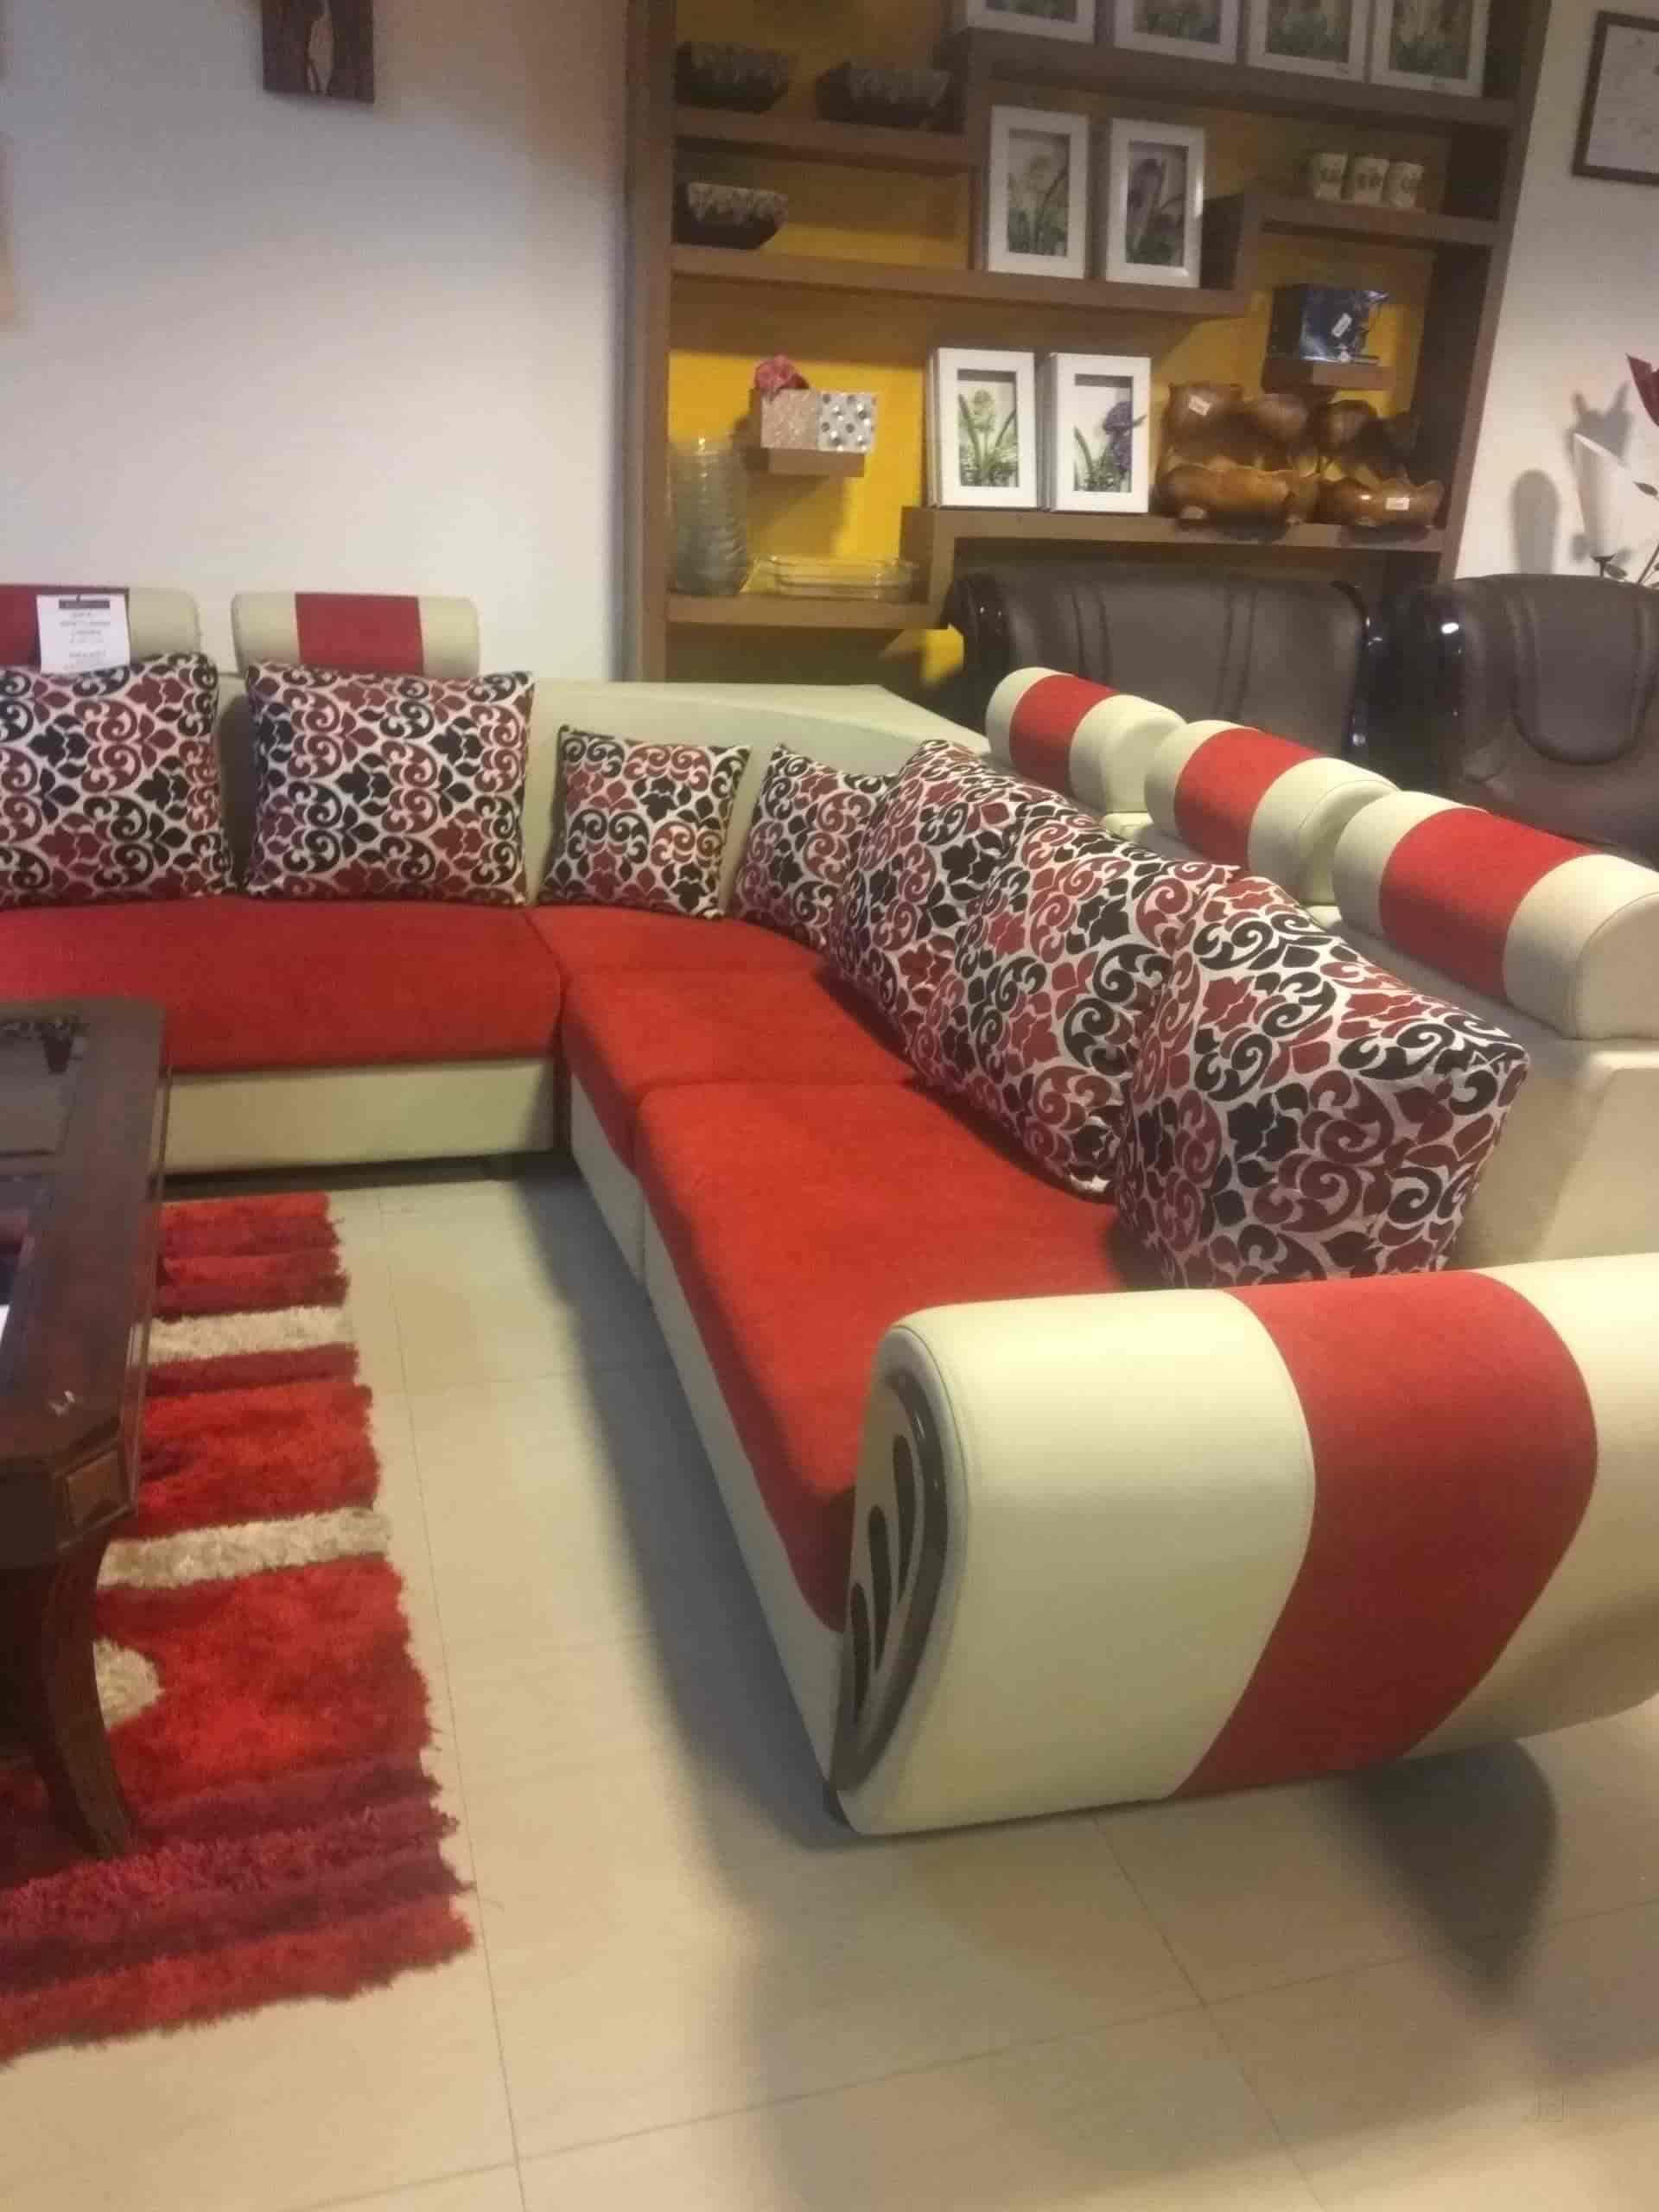 Smaart Home Furniture Iyer Bungalow Furniture Dealers In